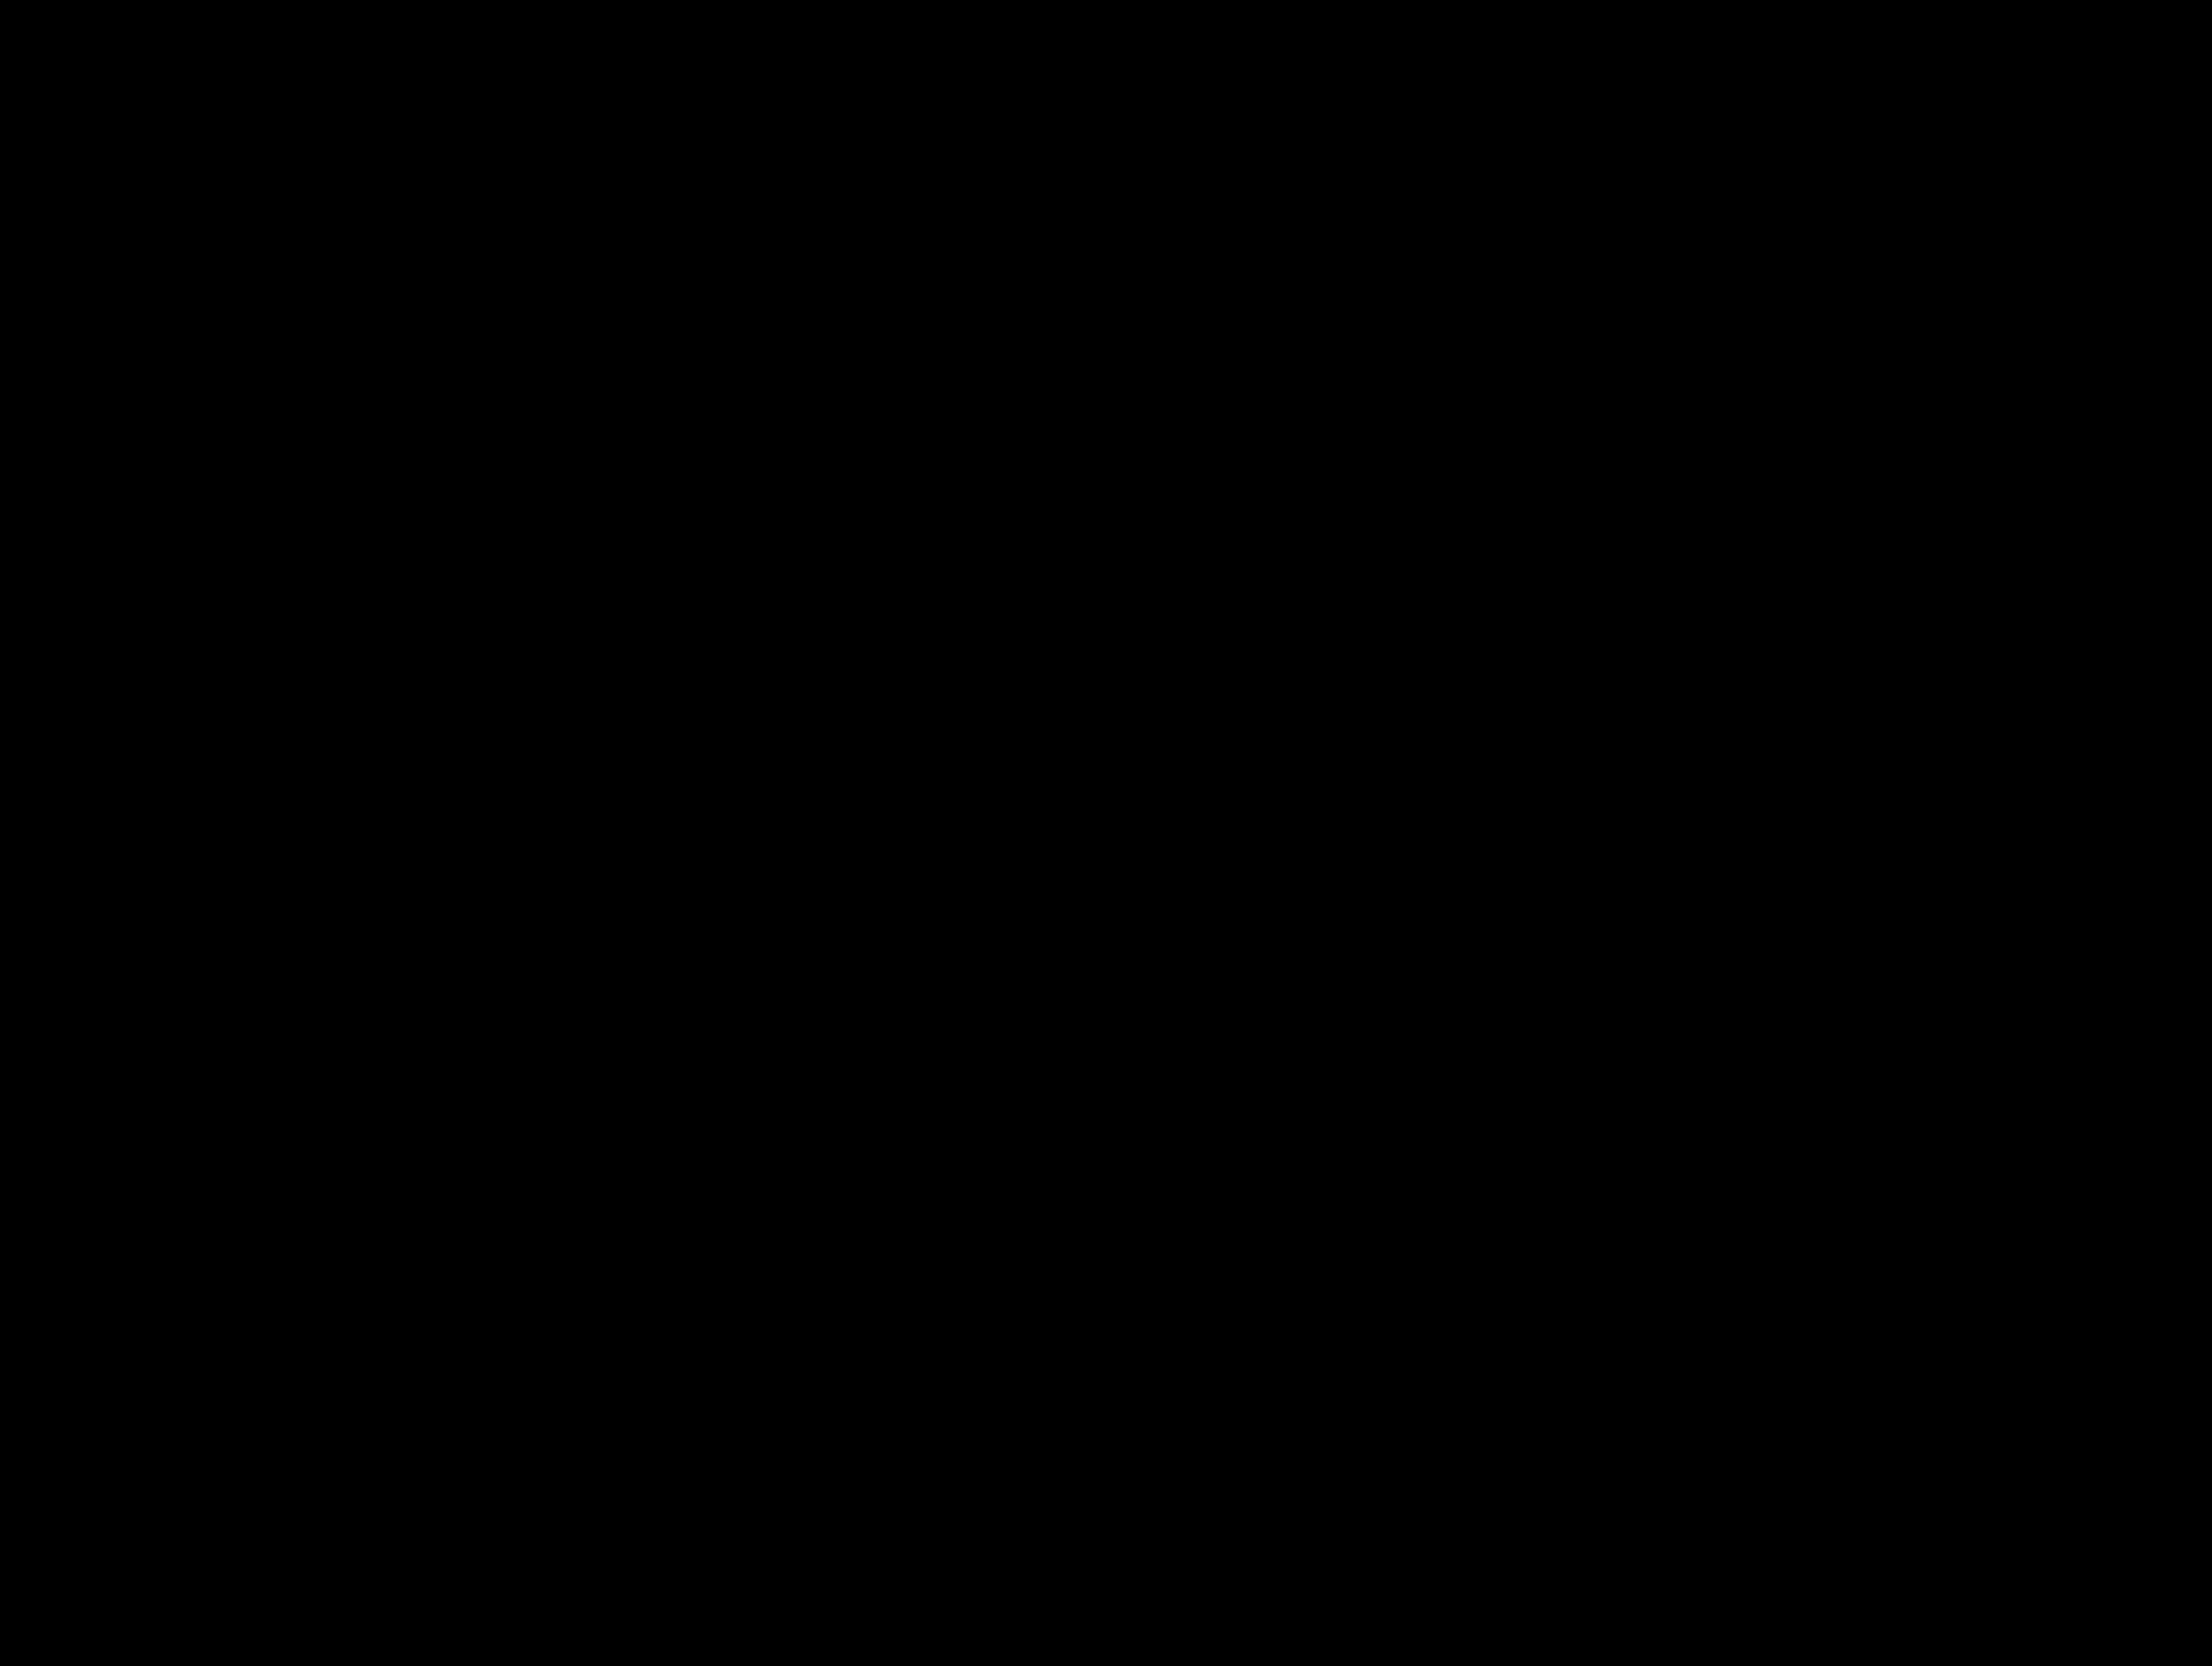 Elbegold Medaille Dresden 2017